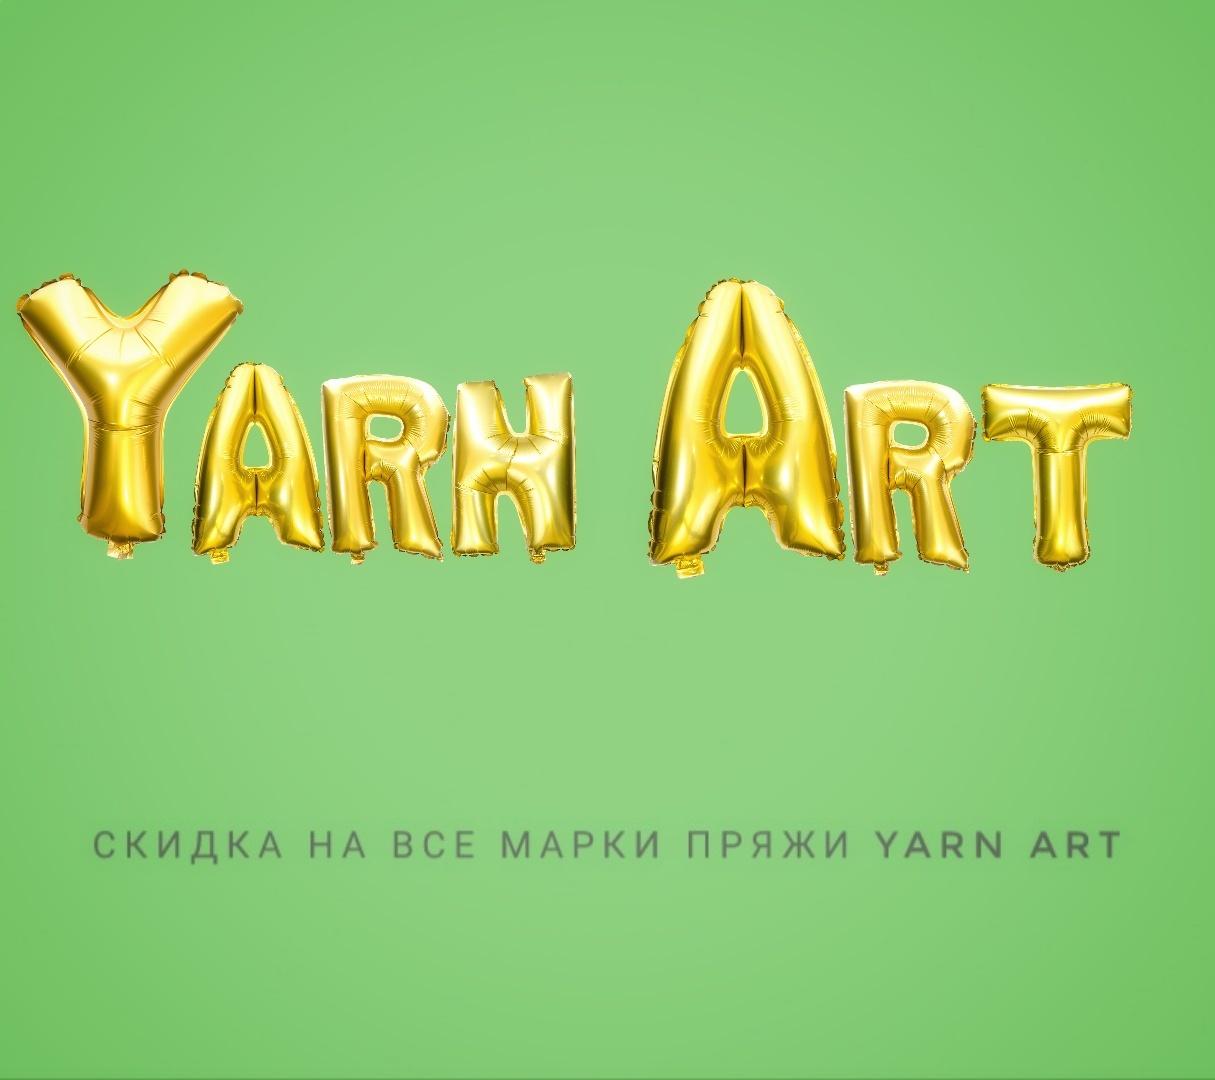 Акция на пряжу Yarn Art!